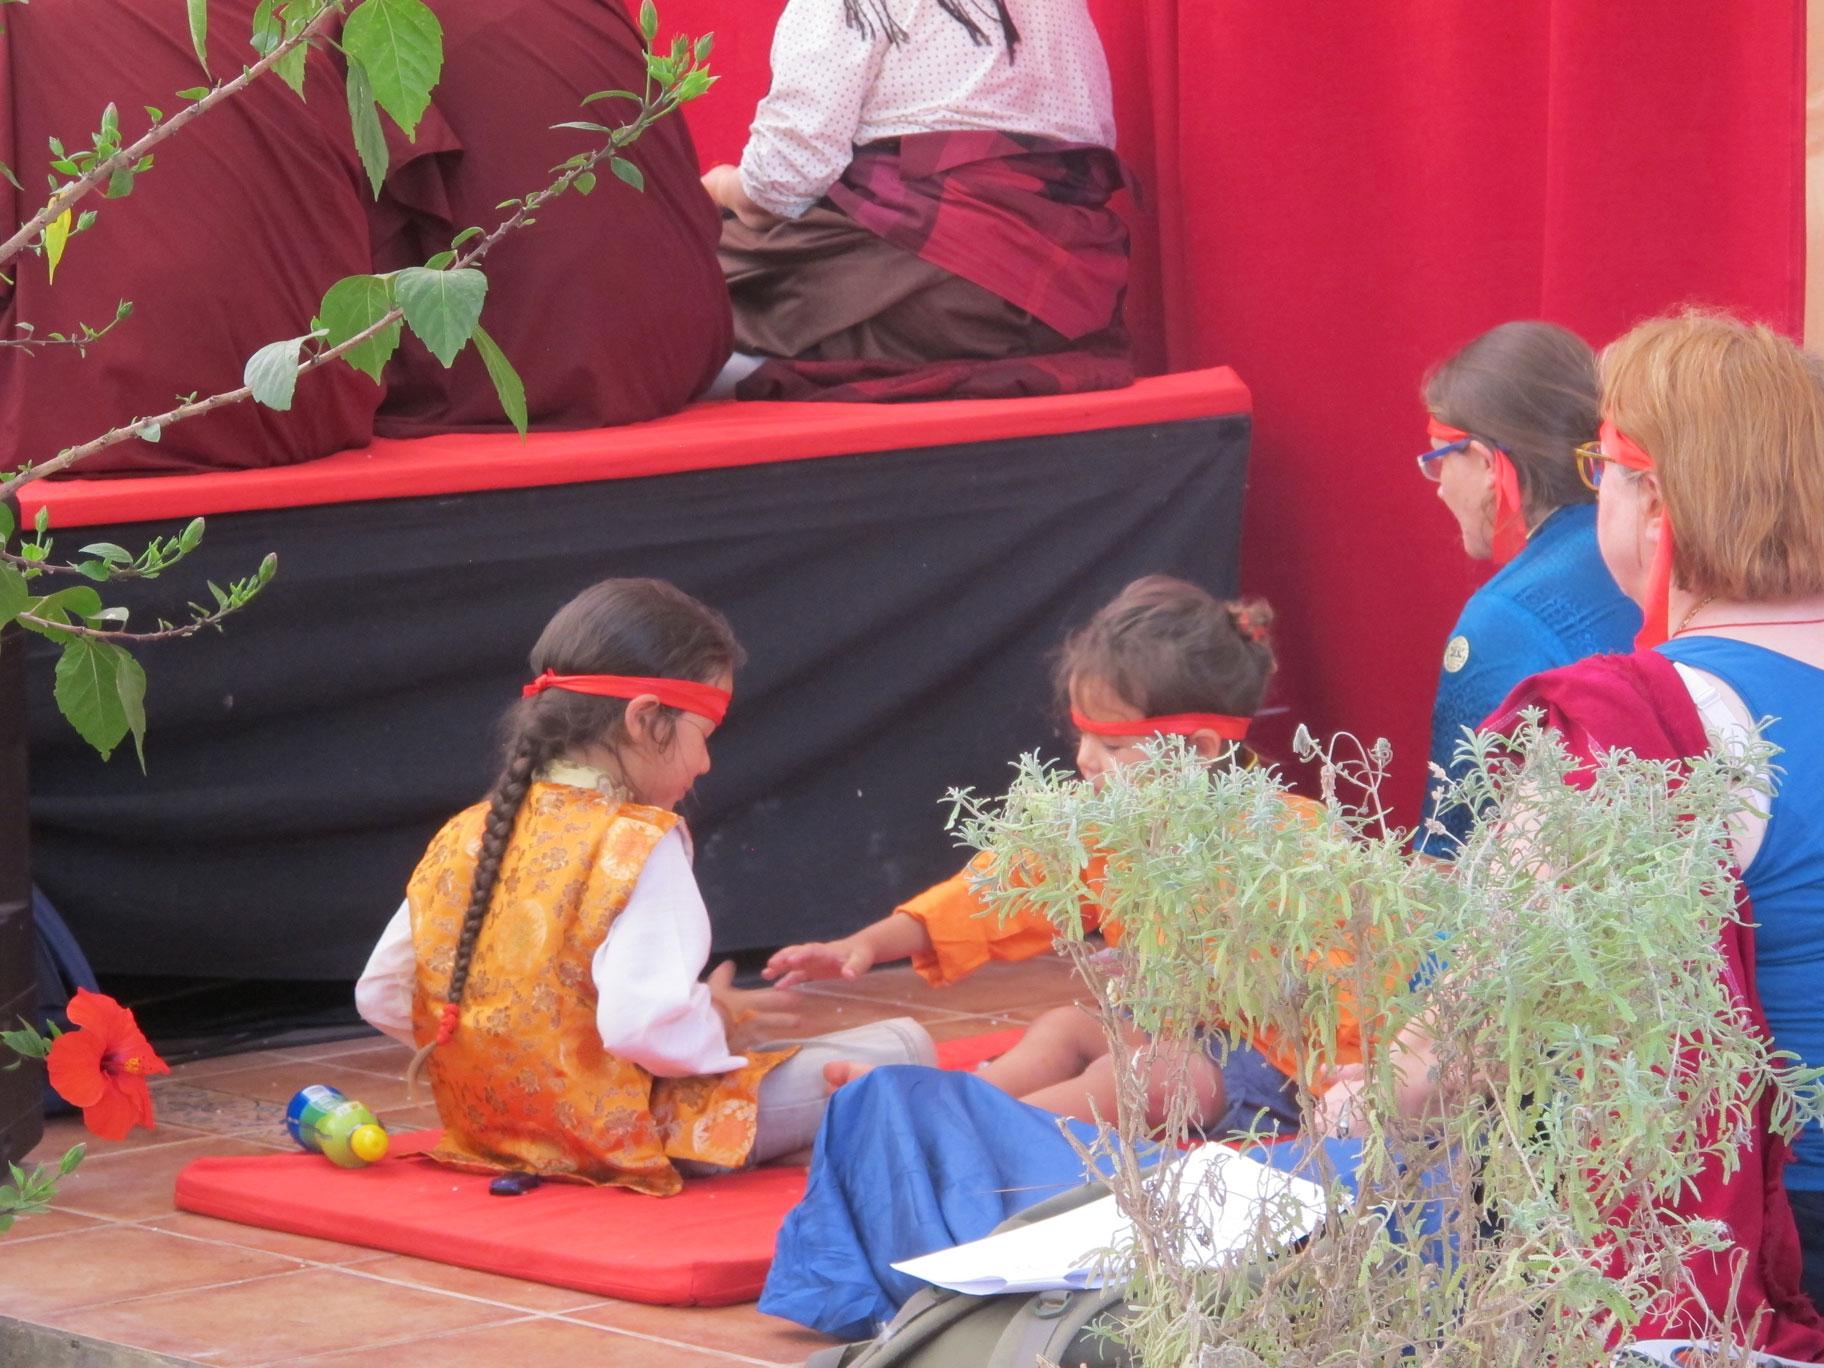 SS-Dudjom-Rinpoche-Sangye-Pema-Zhepa-evento-valencia-julio-2019-011